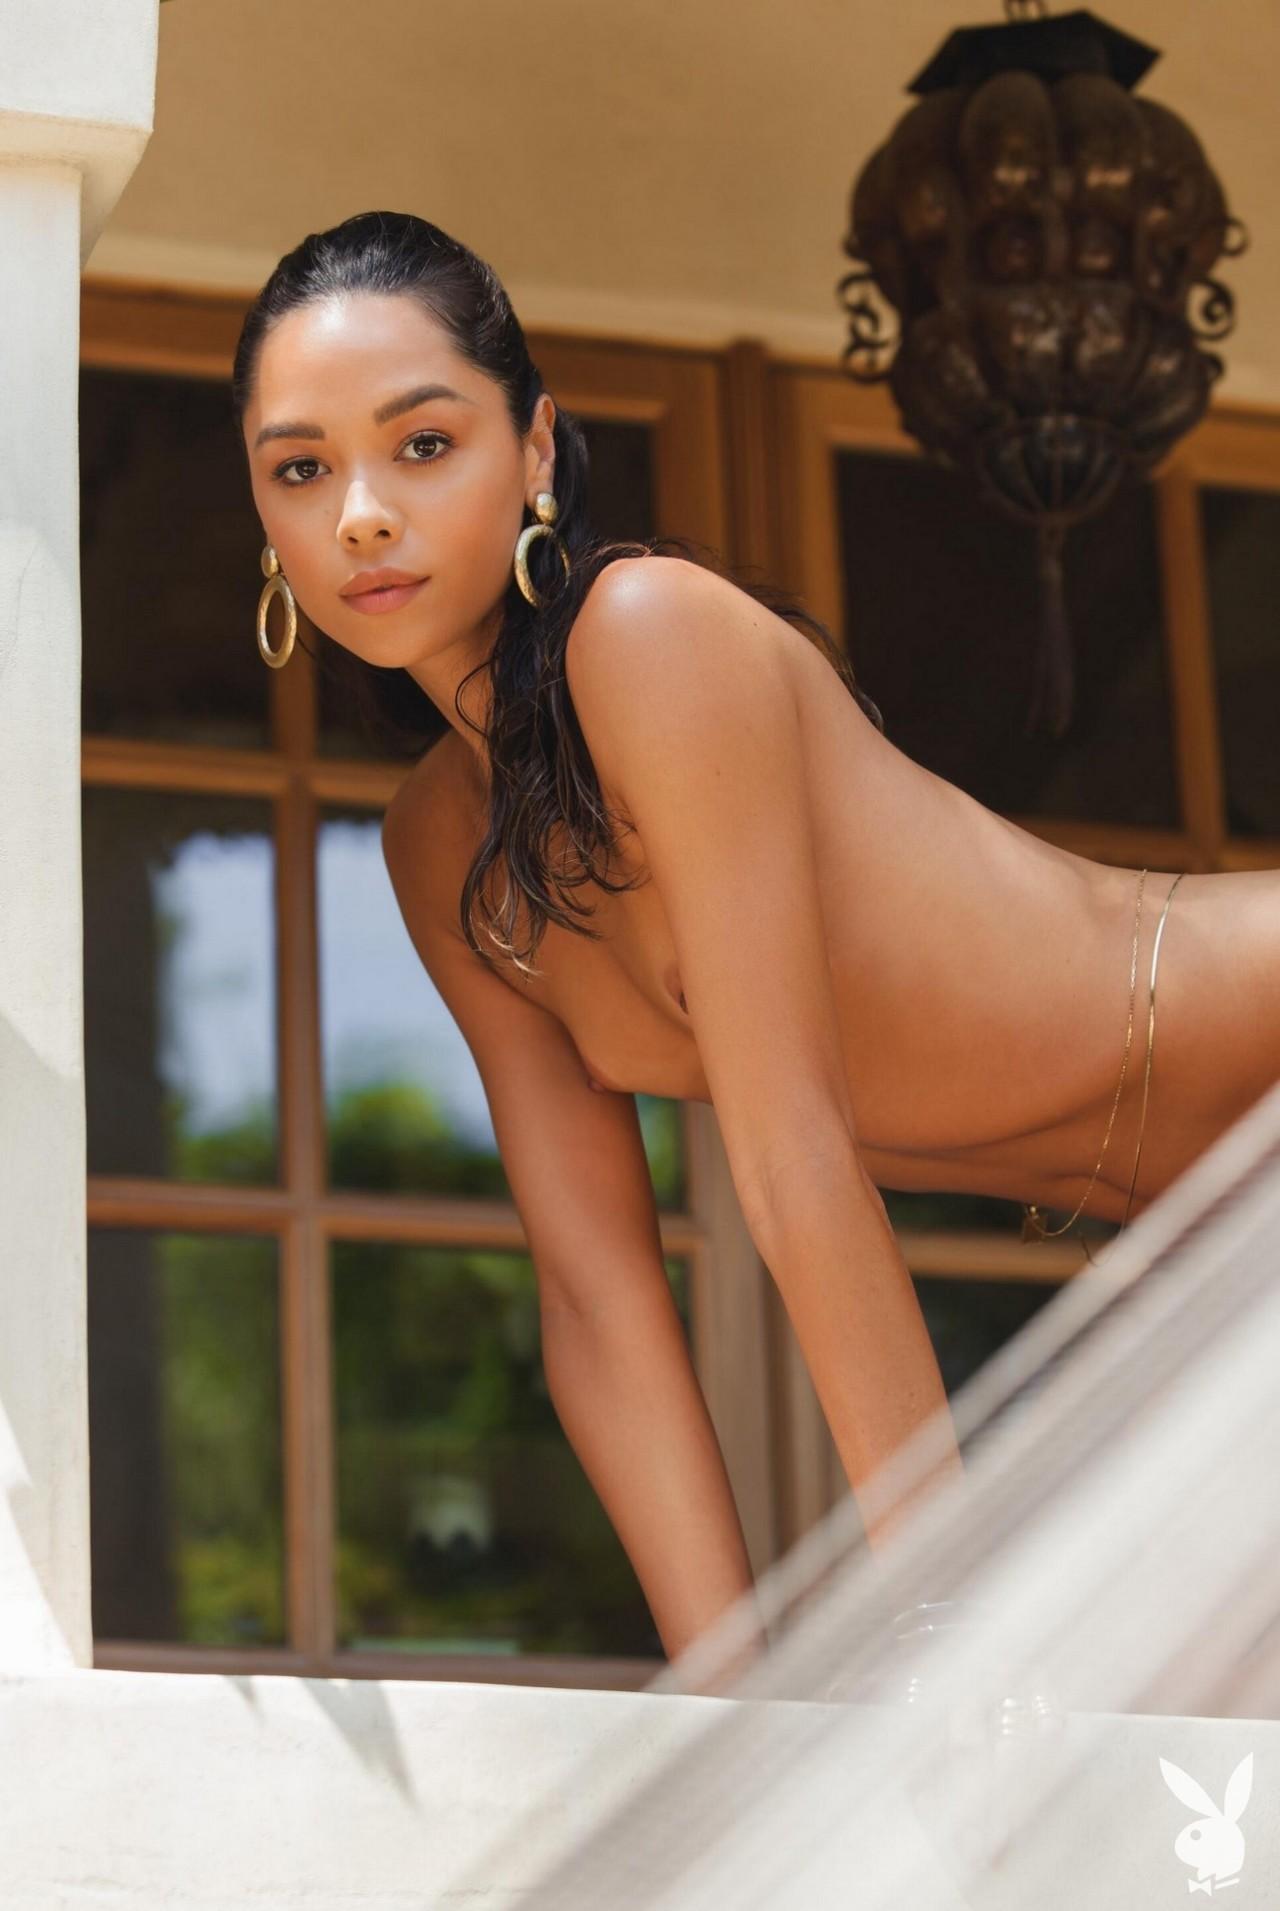 Playmate September 2020 Danielle Alcaraz Playboy Plus (14)